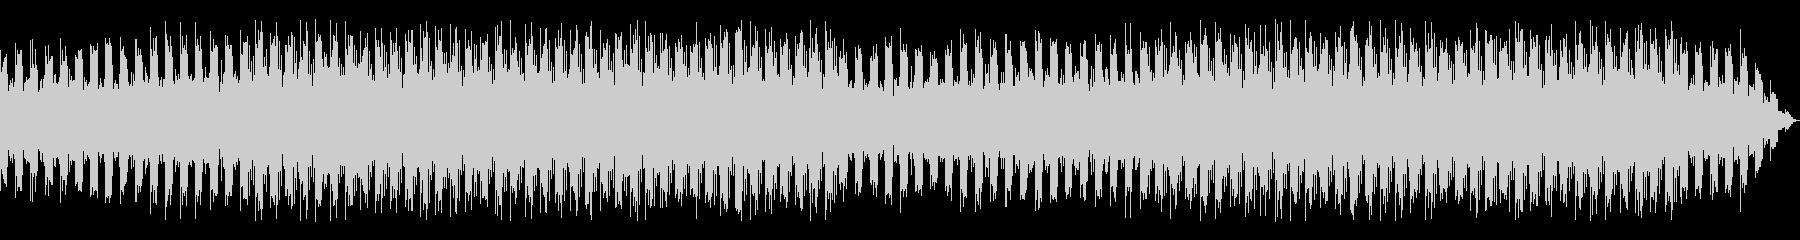 AIやアンドロイドのシステム起動中の未再生の波形